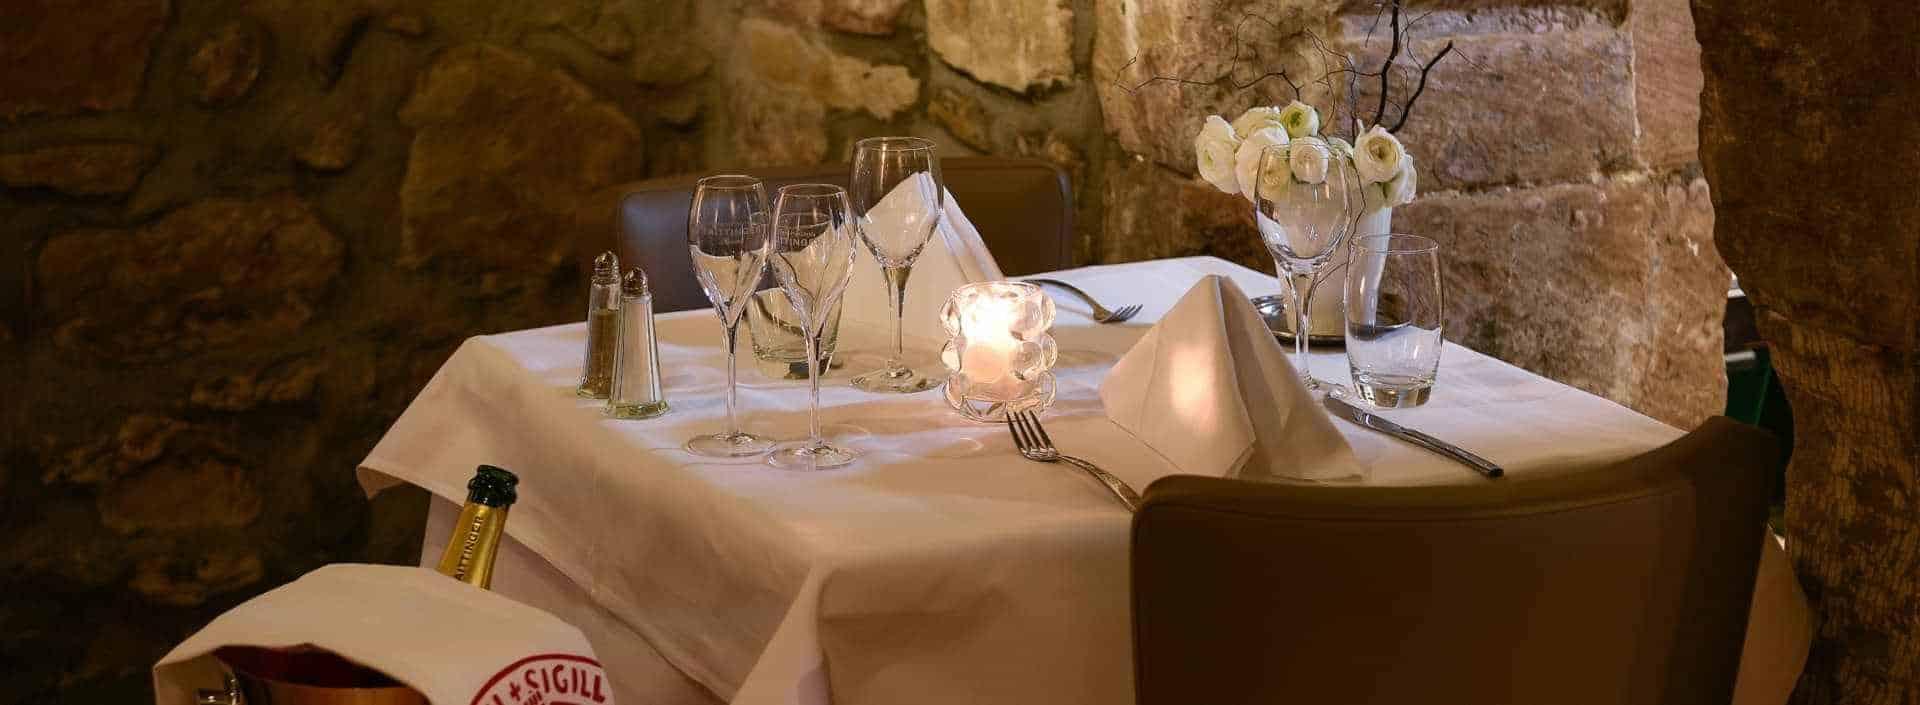 Restaurant in Chambesy - Restaurant l'Auberge in Chambesy | Restaurant l'Auberge in Chambesy Restaurant l'Auberge in Chambesy Restaurant l'Auberge in Chambesy - Book Your Table at The Restaurant l'Auberge in Chambesy Switzerland